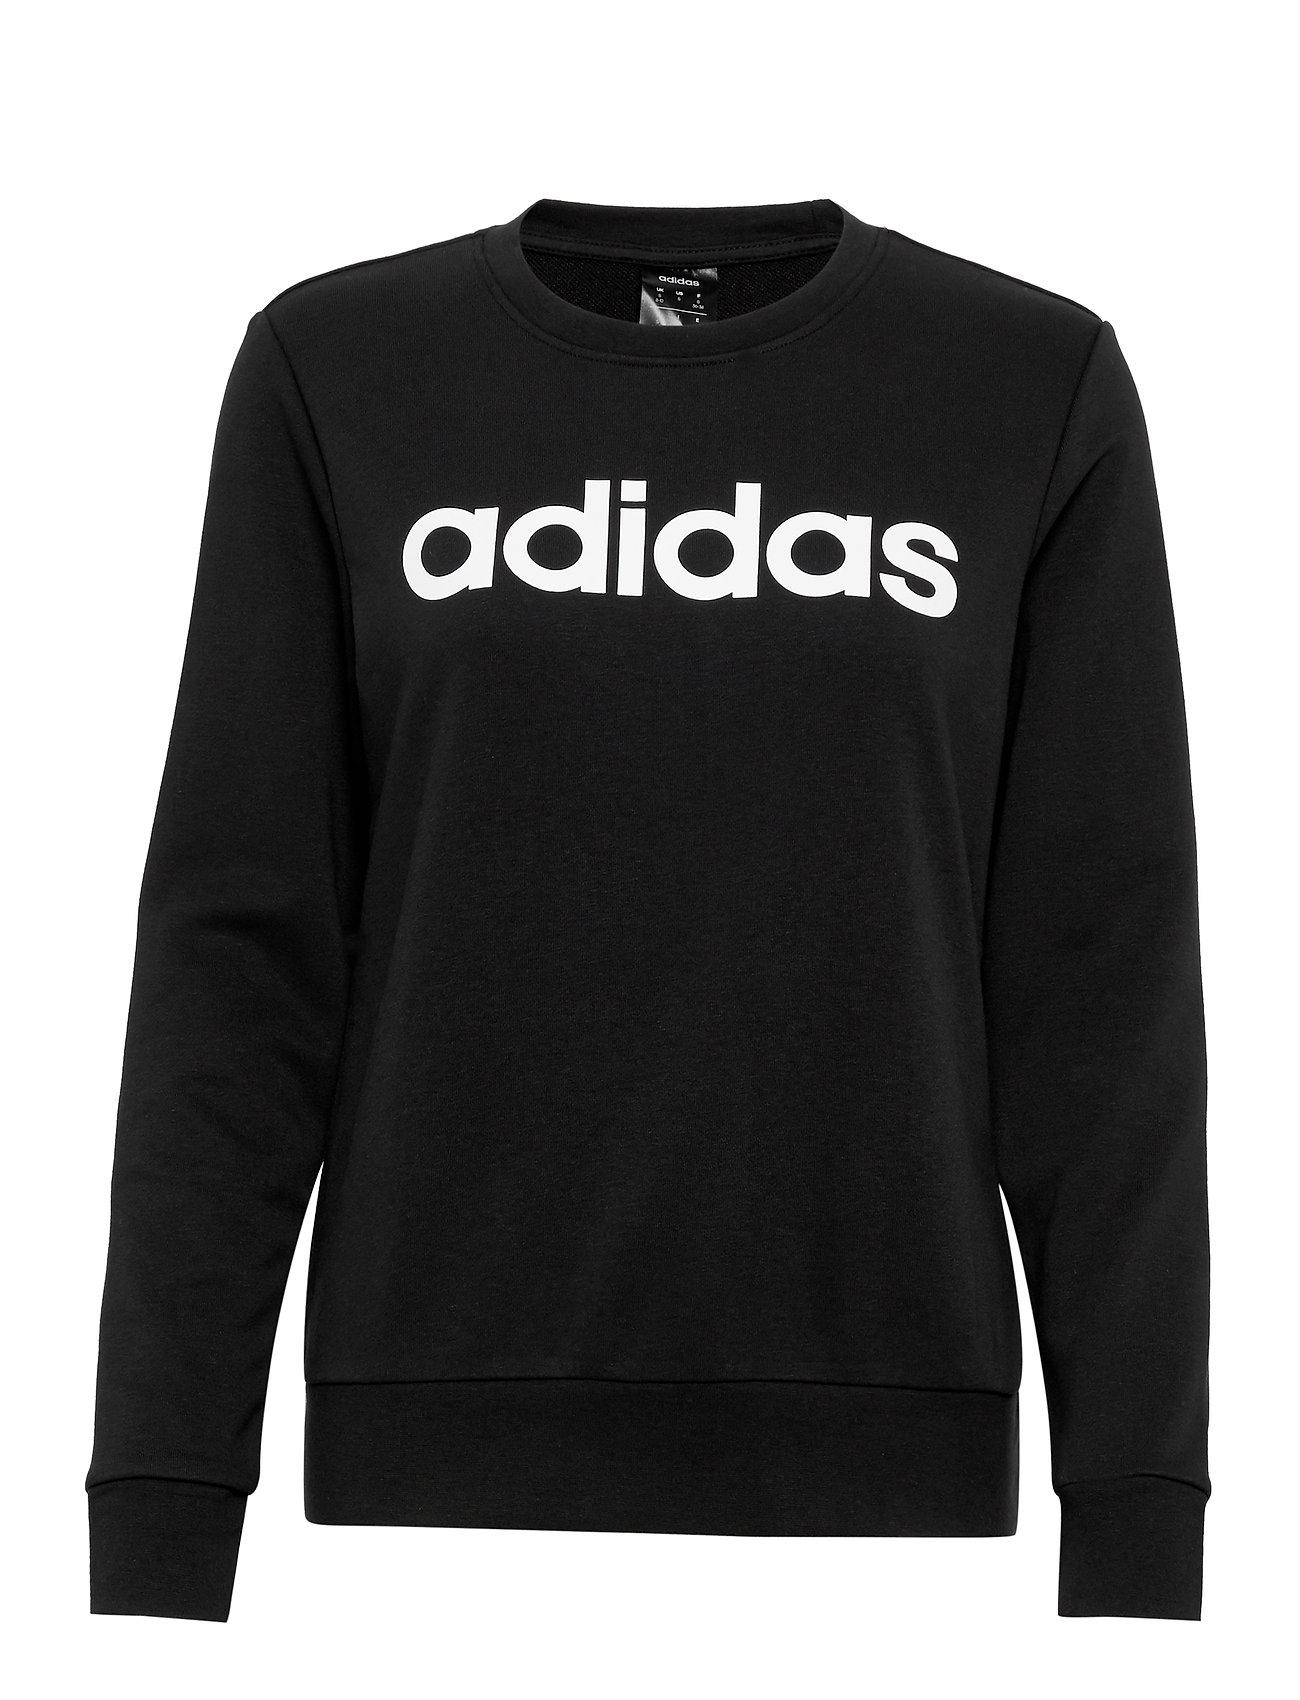 adidas Performance W E LIN SWEAT - BLACK/WHITE